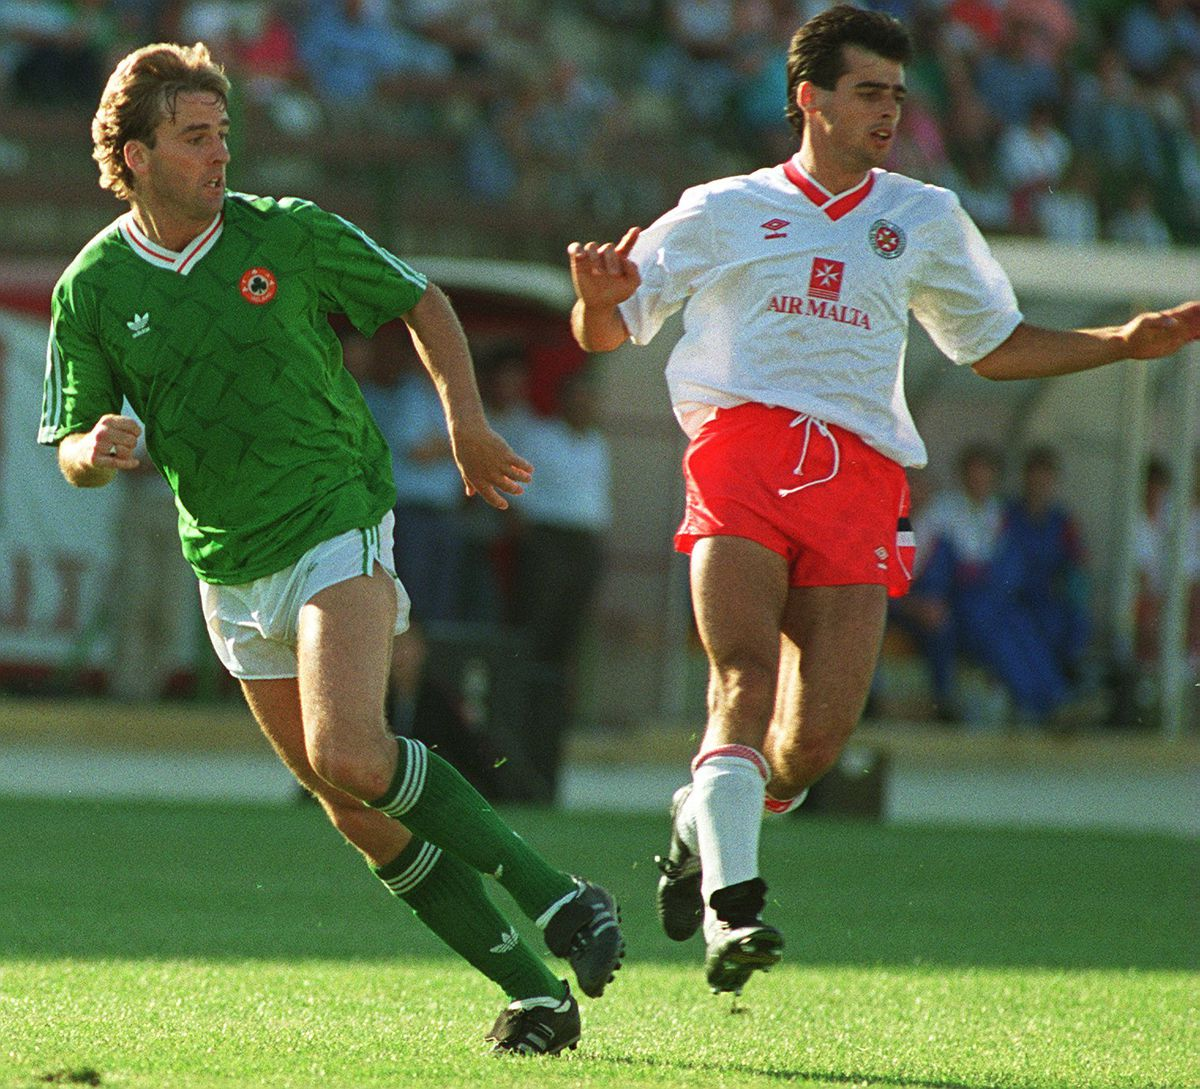 Soccer - International Friendly - Malta v Ireland